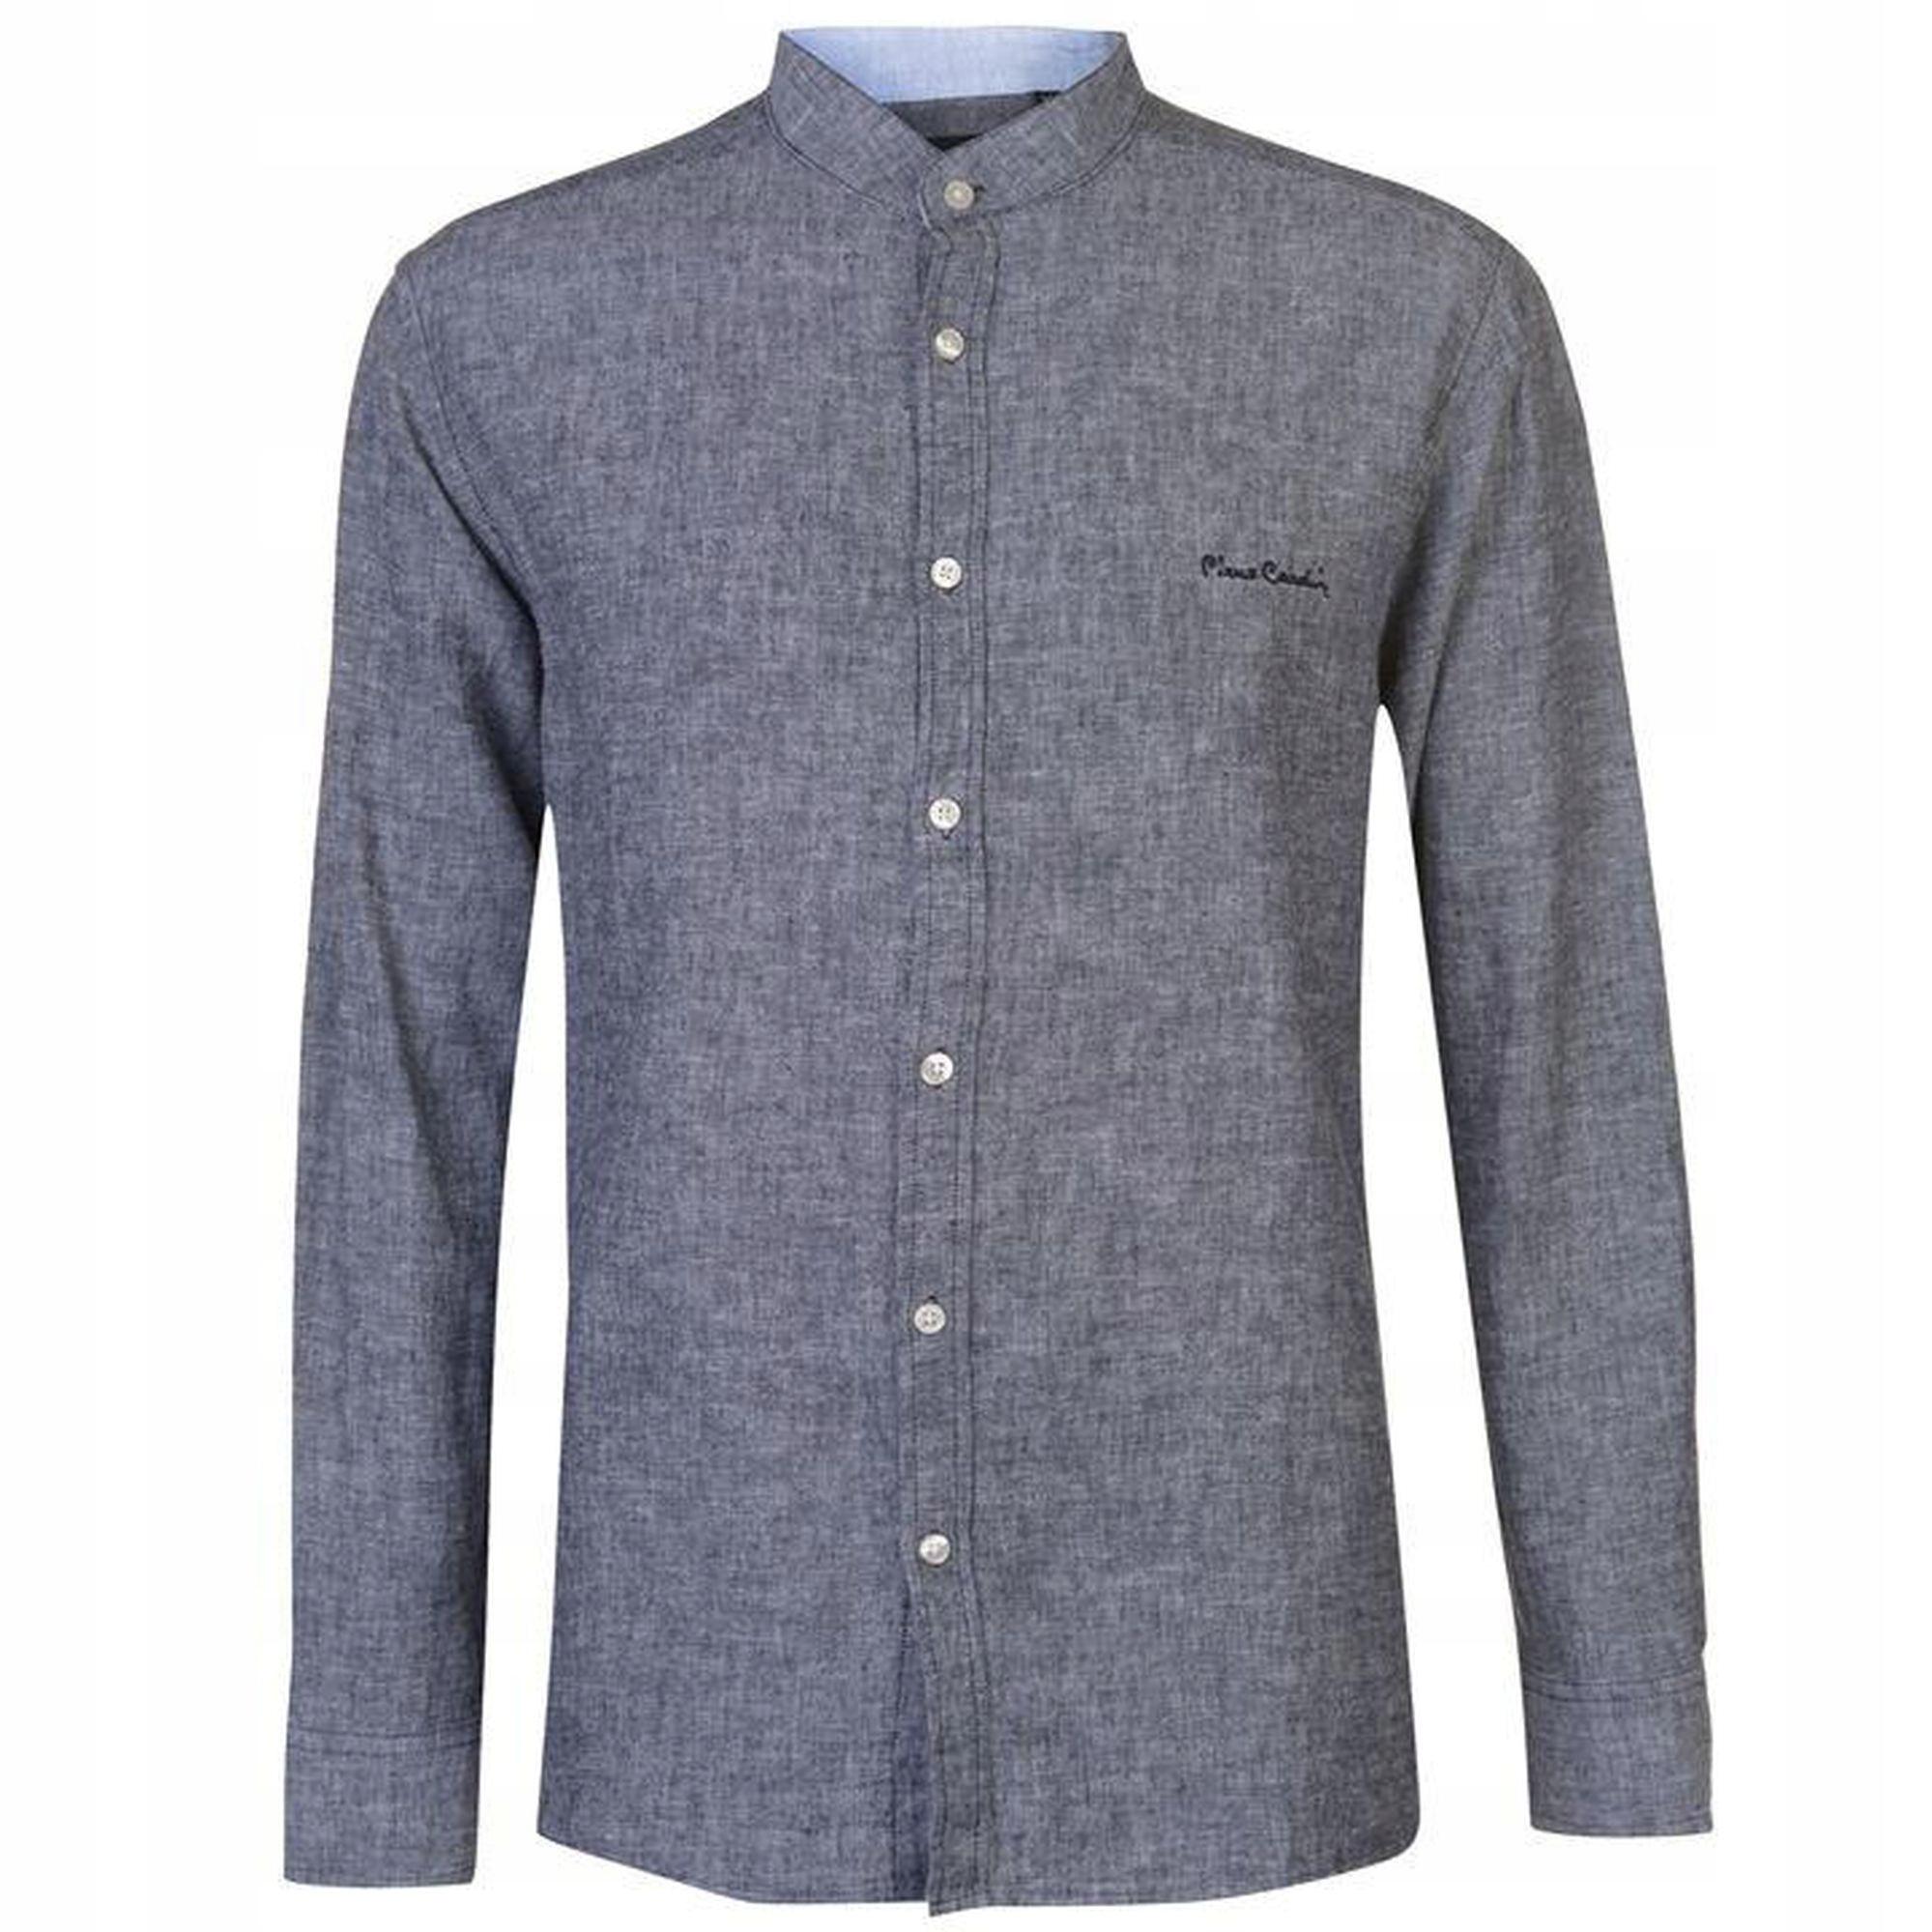 Koszula lniana PIERRE CARDIN stójka len bawełn XL